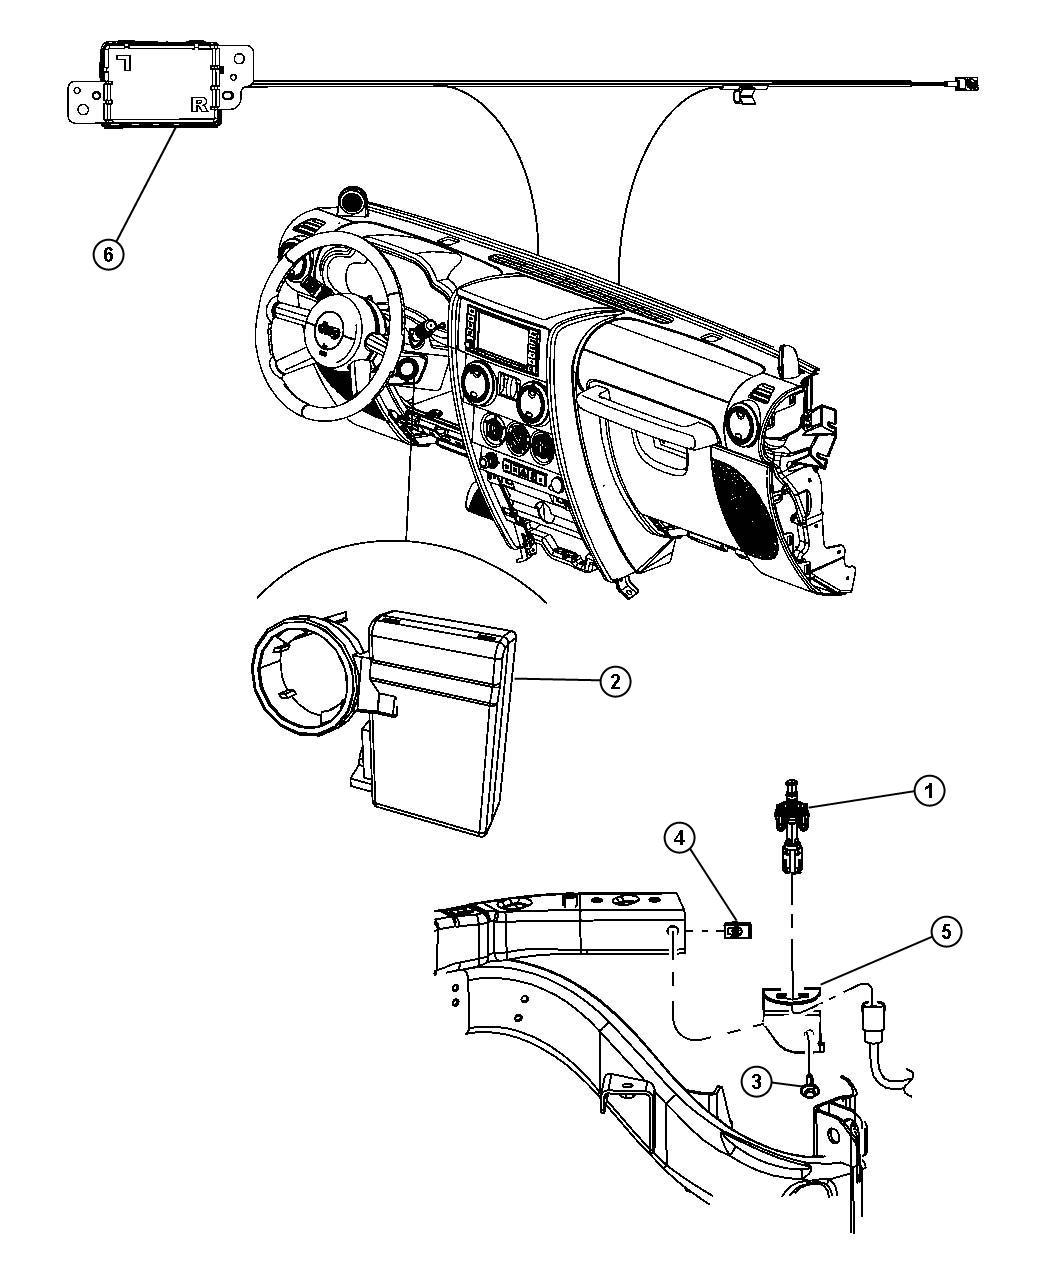 Jeep Wrangler Unlimited Sahara 3 8l V6 A T 4x4